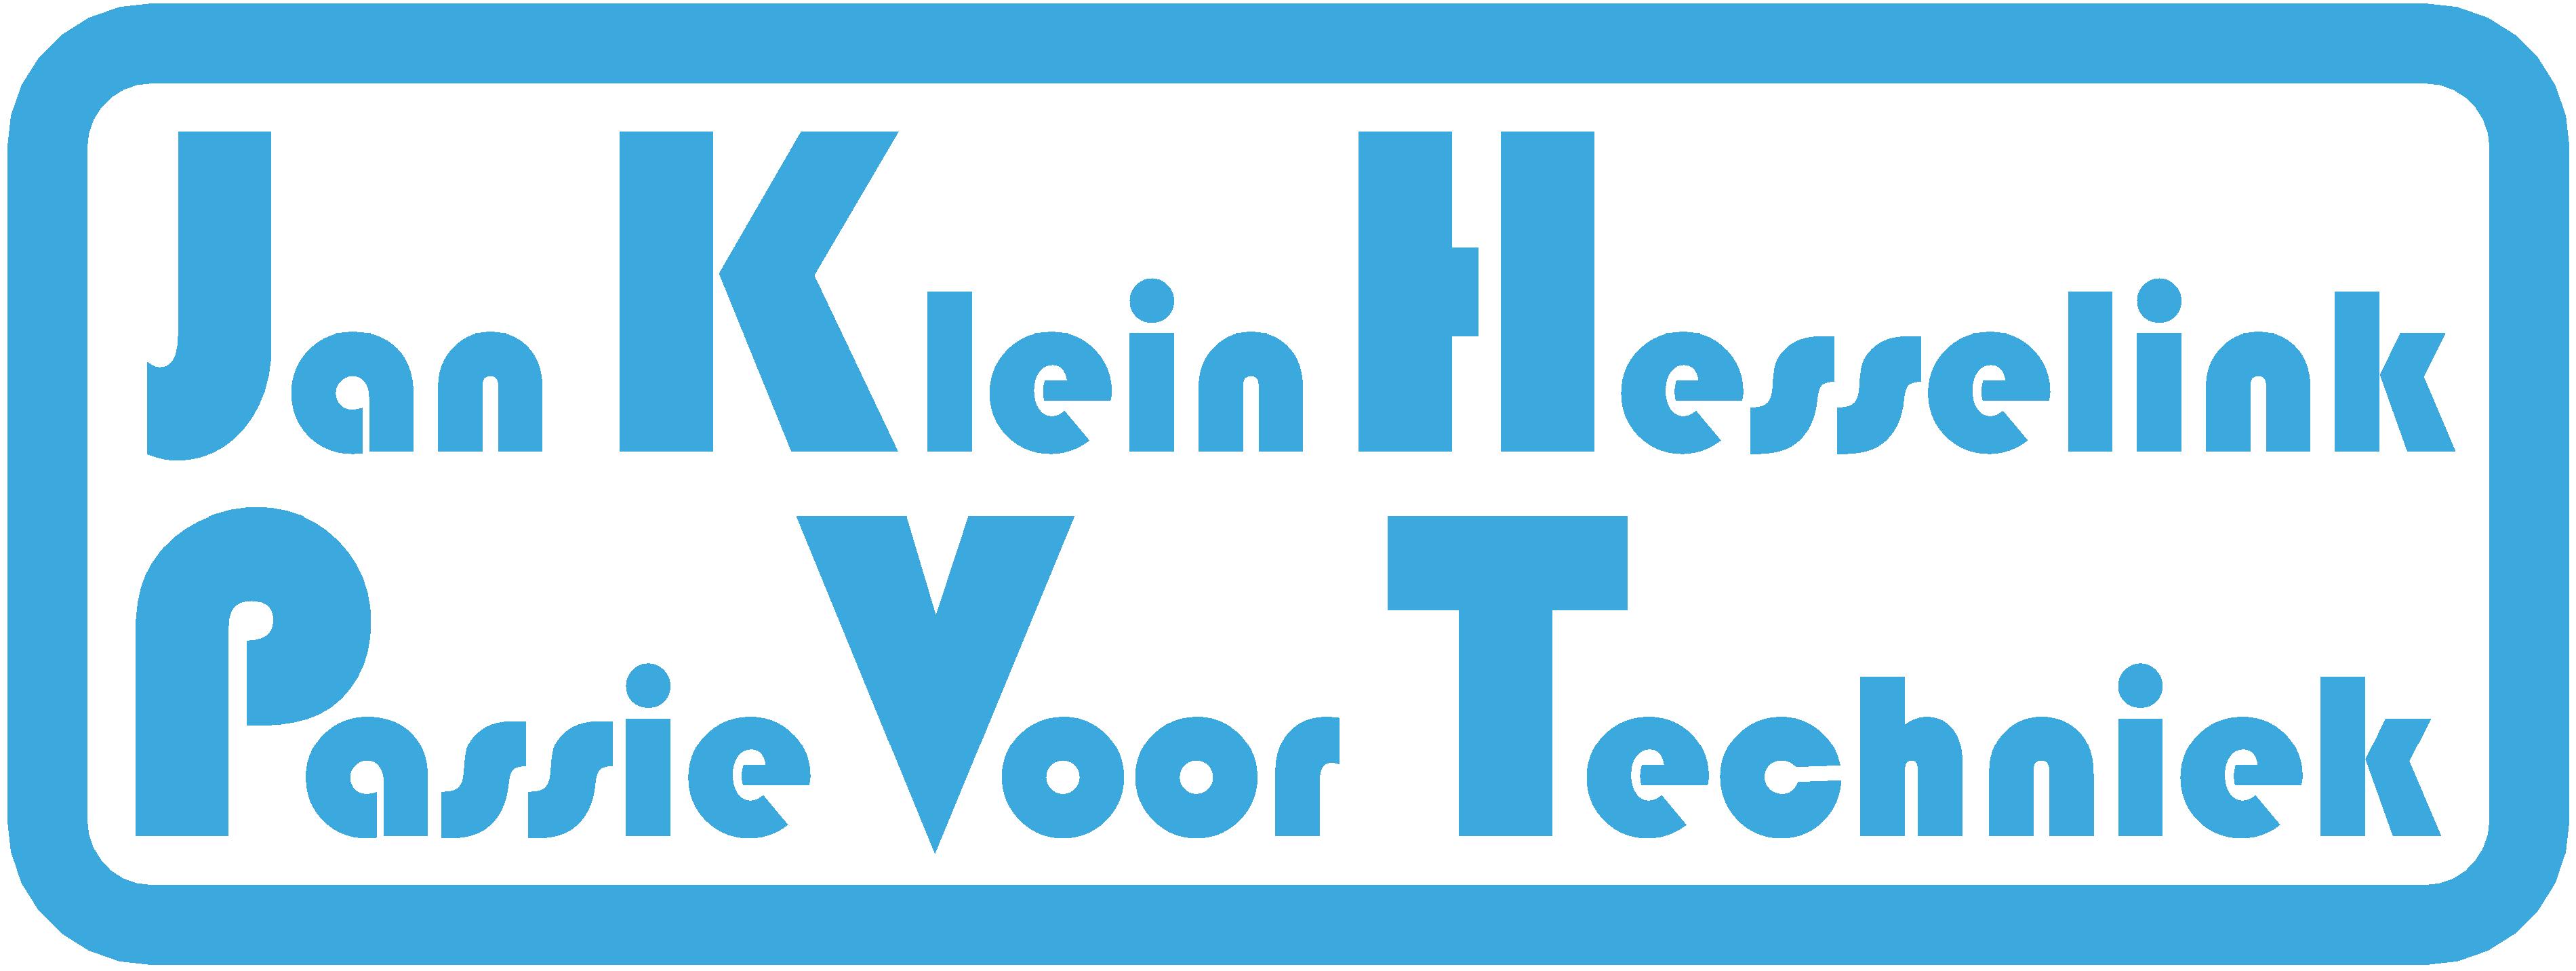 jankh-pvt.nl